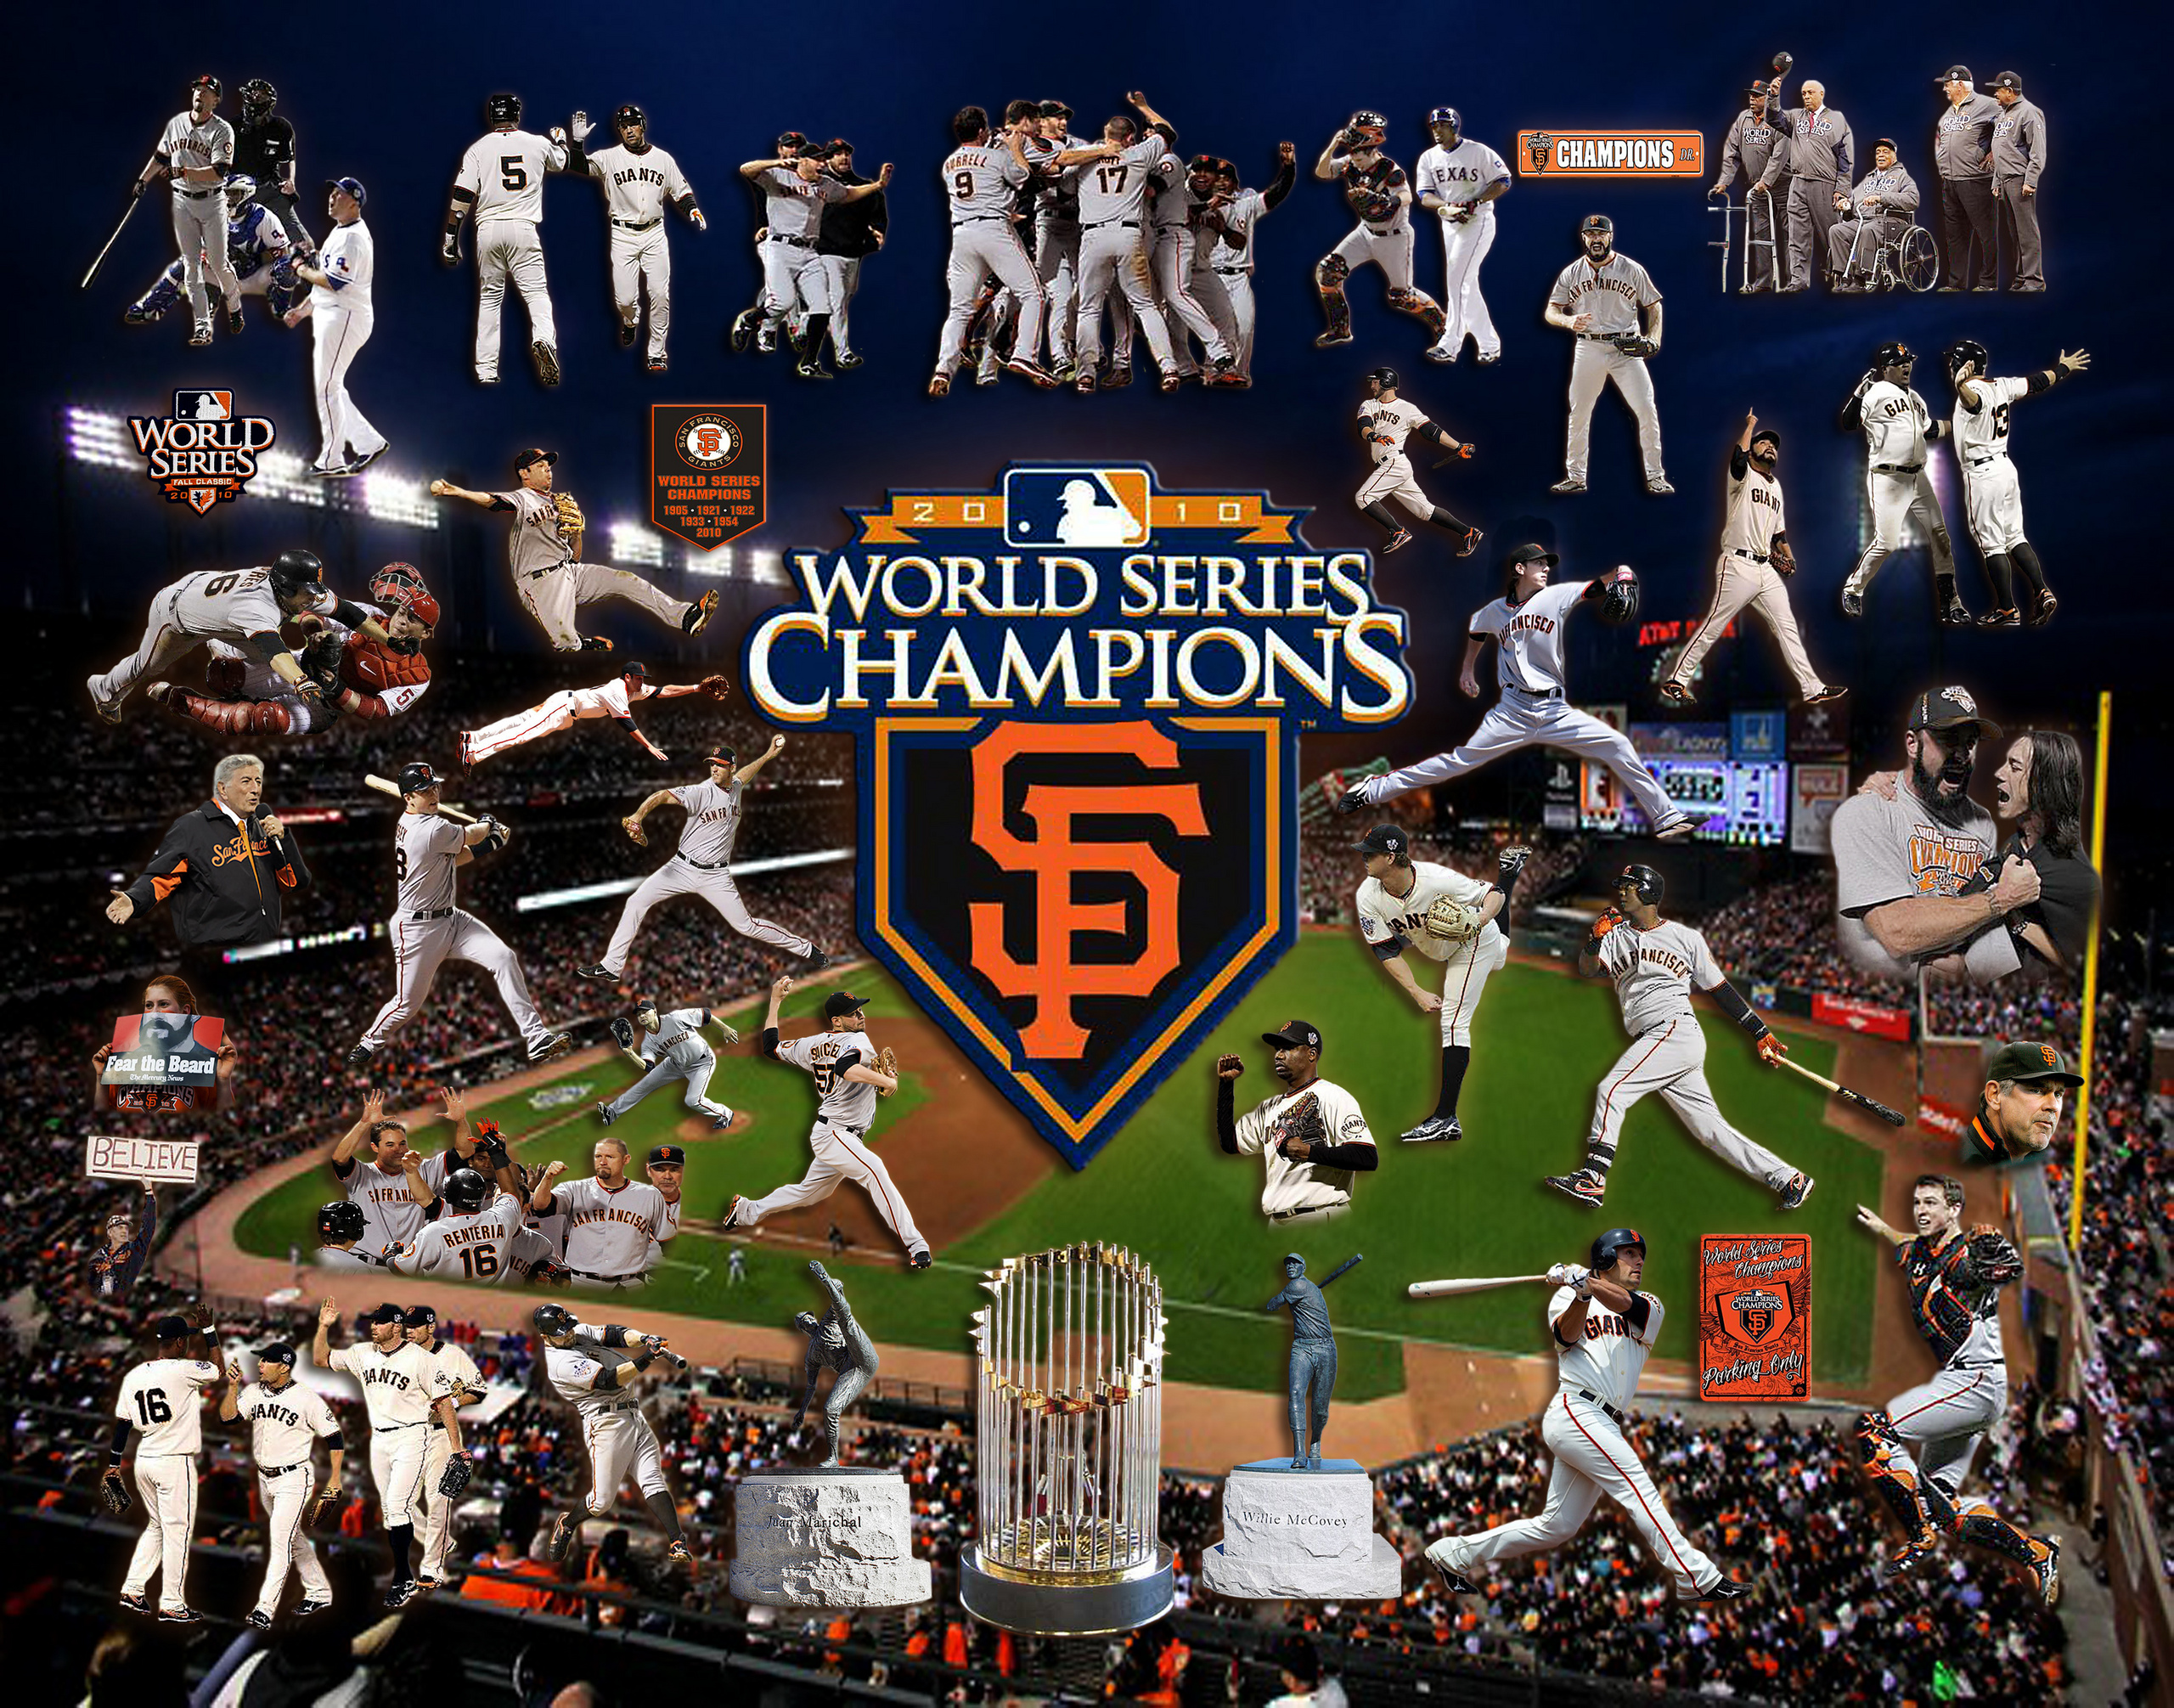 World Series Champions - San Francisco Giants Photo